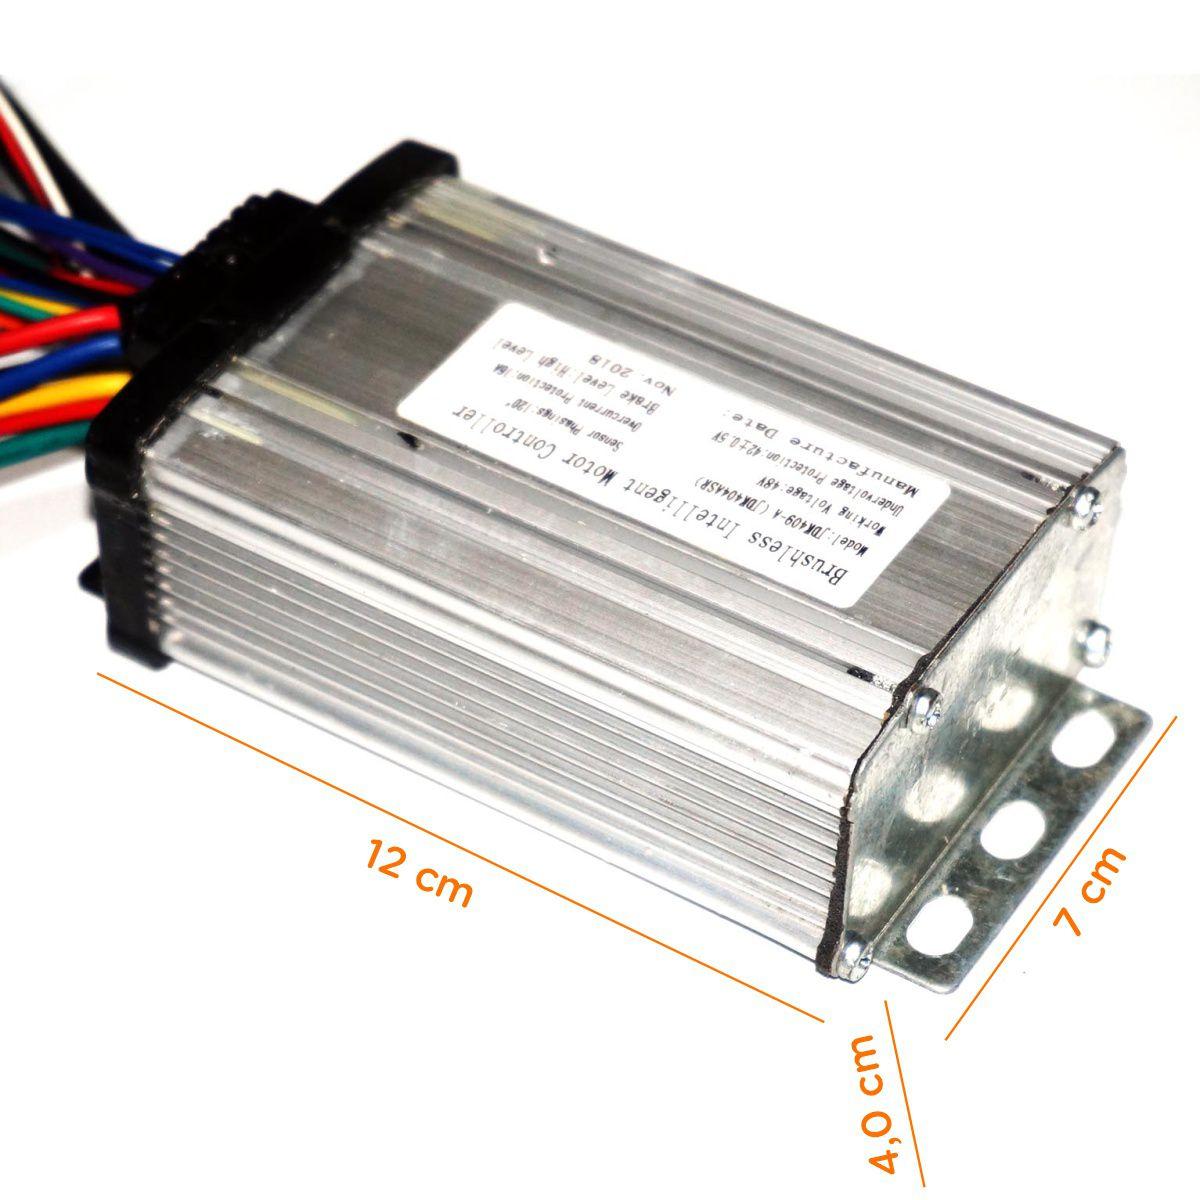 Controladora 48v p/ Alarme JS 150